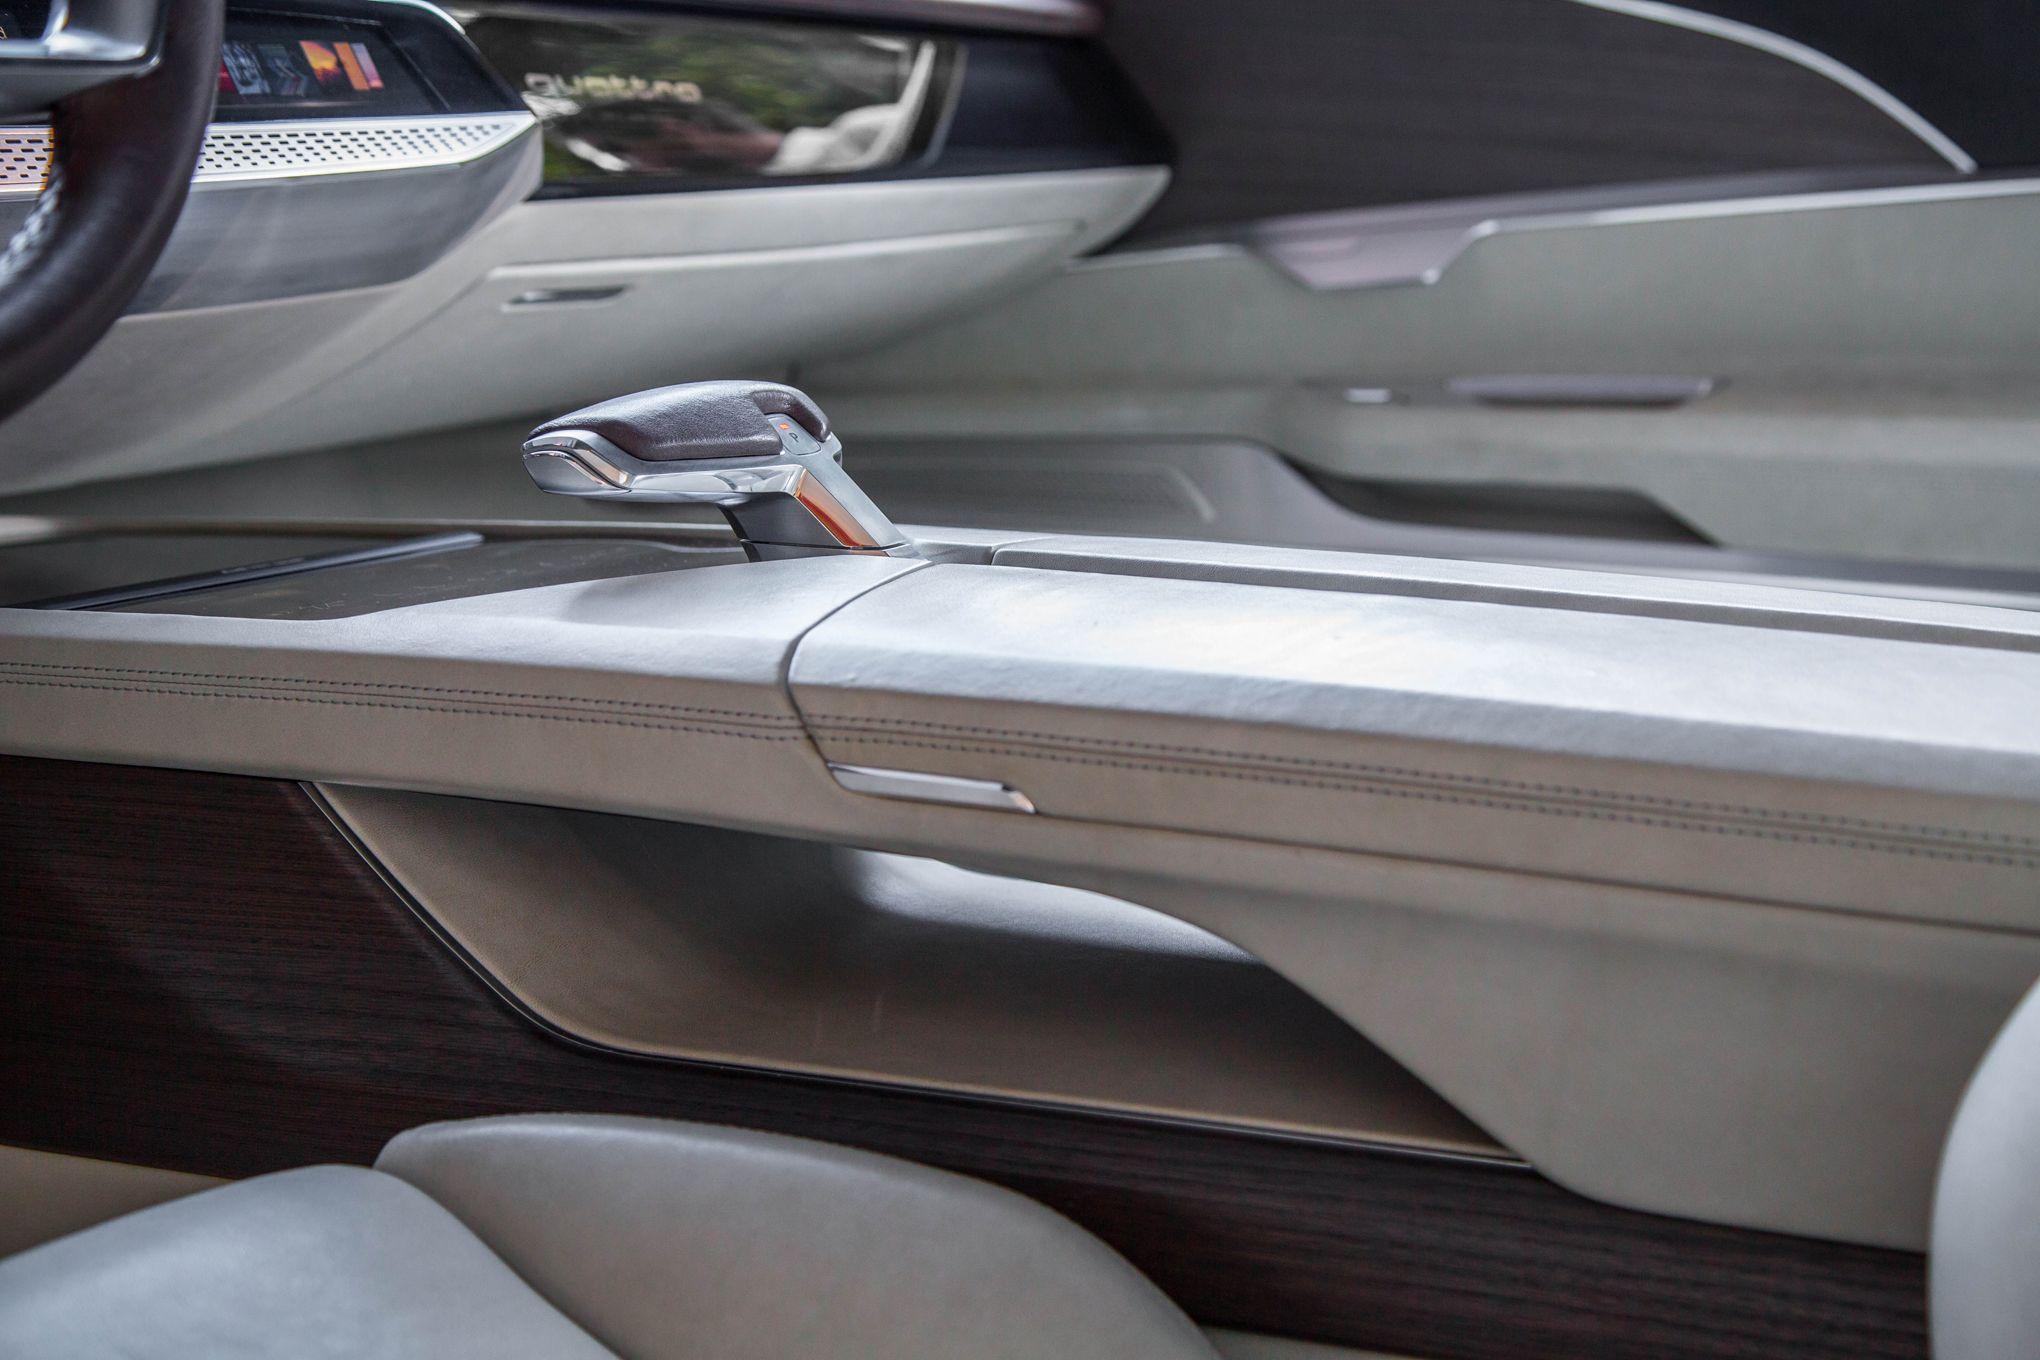 dashboard audi a9 - Google Search | car interior | Pinterest